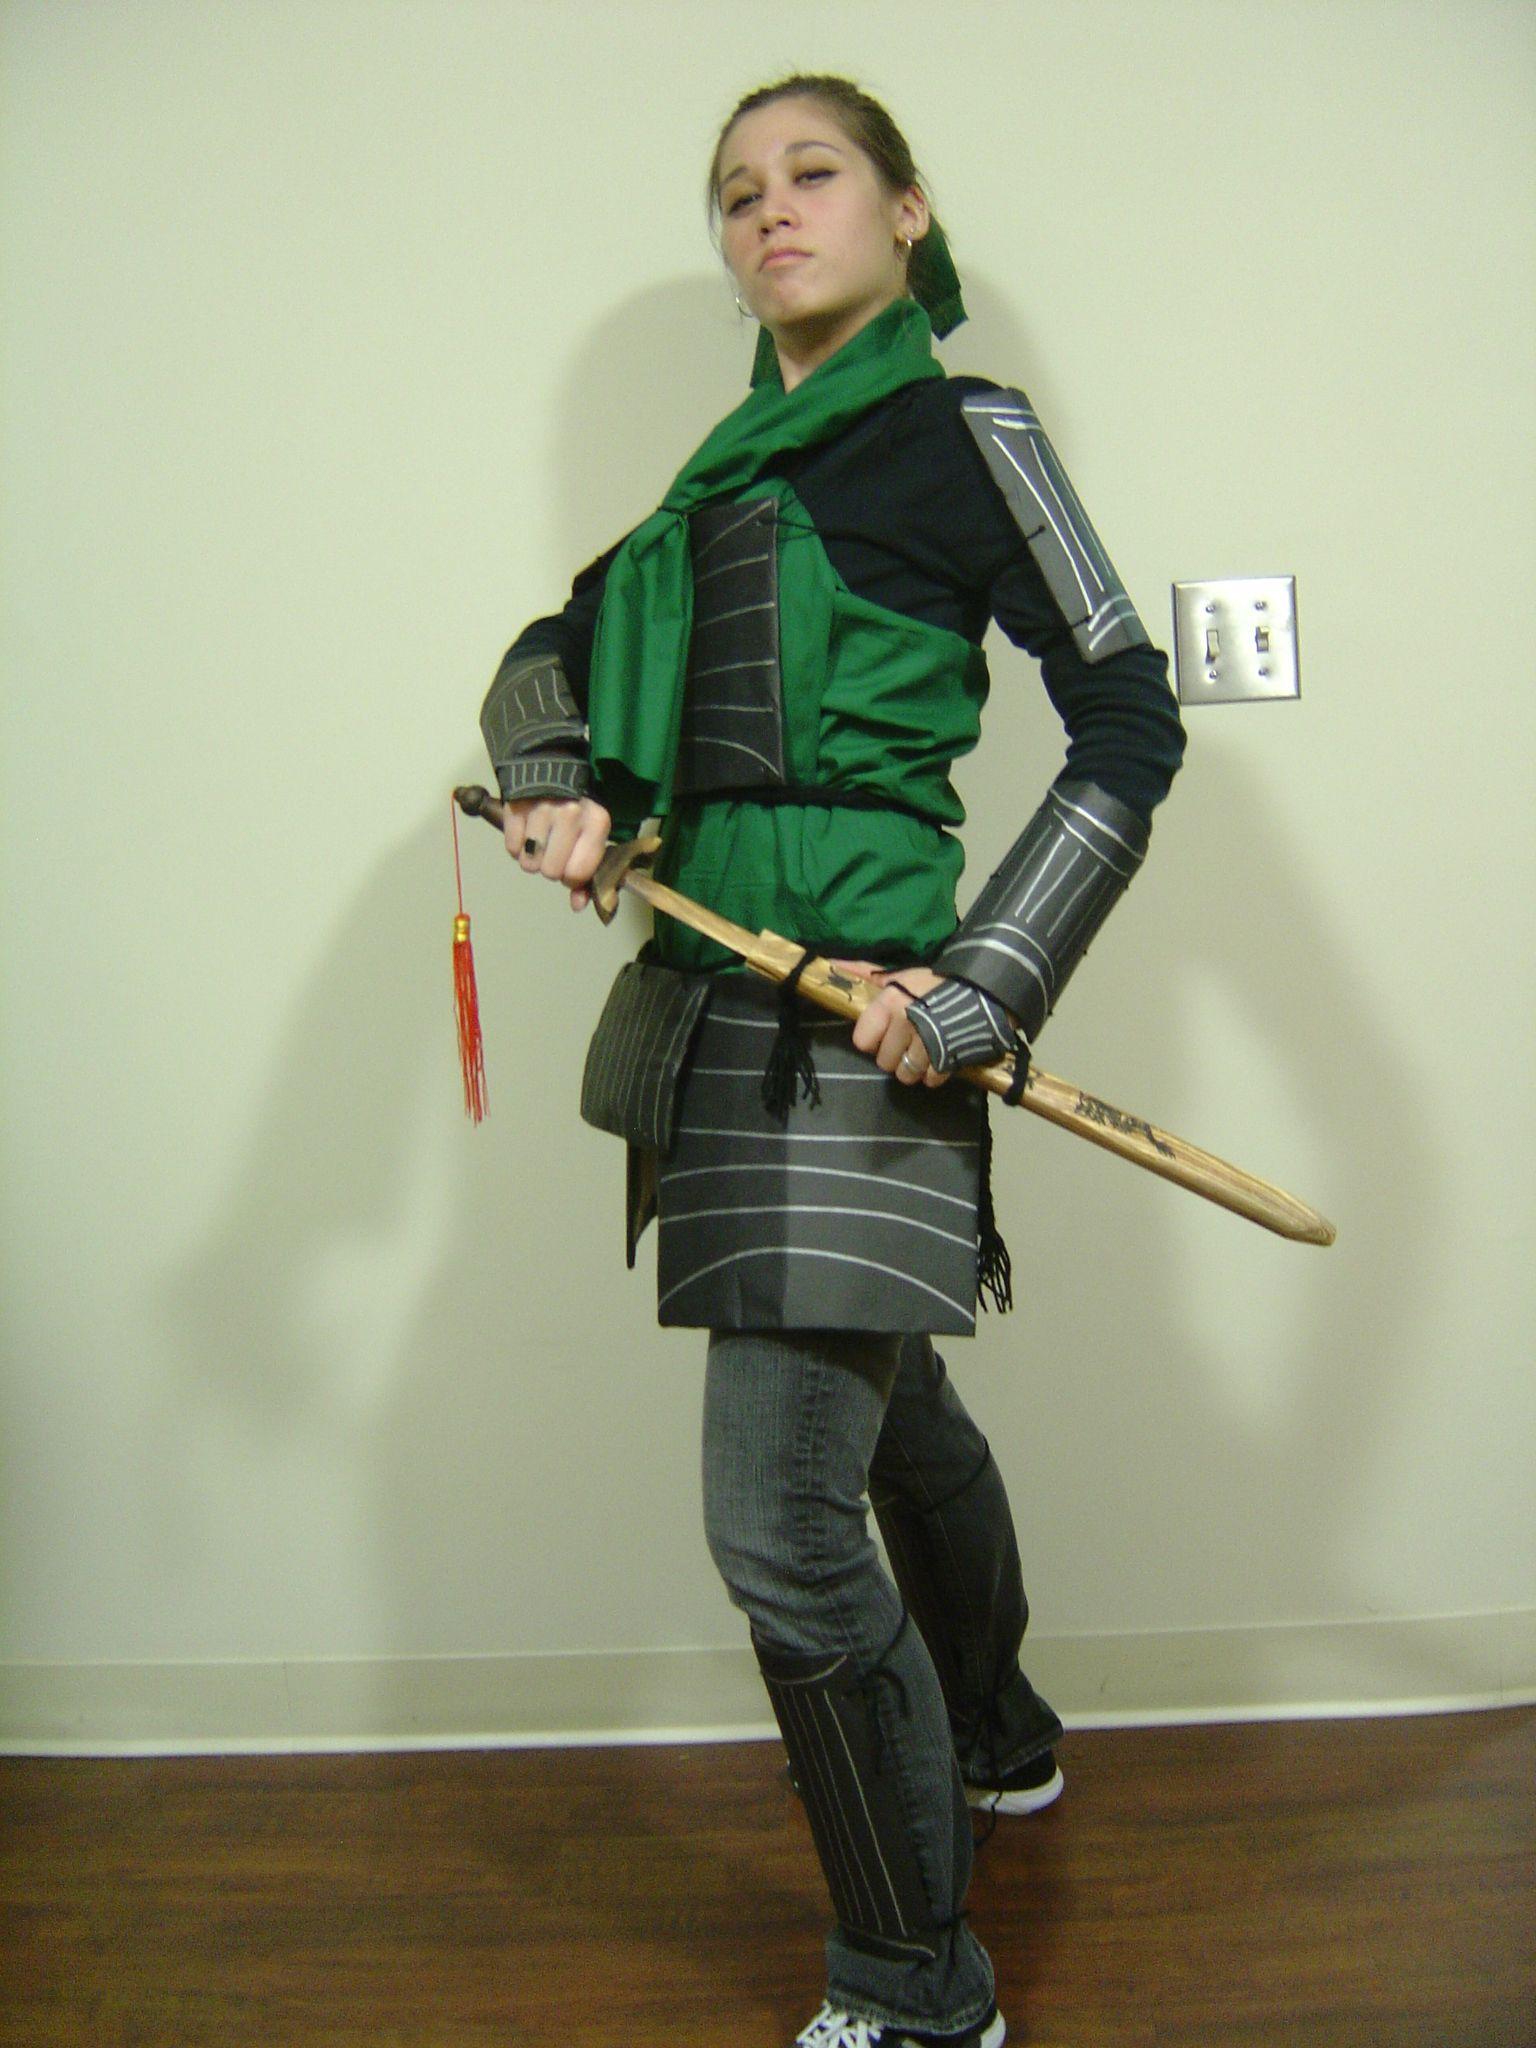 Diy Merida Costume Cecdaedcfcddfaf